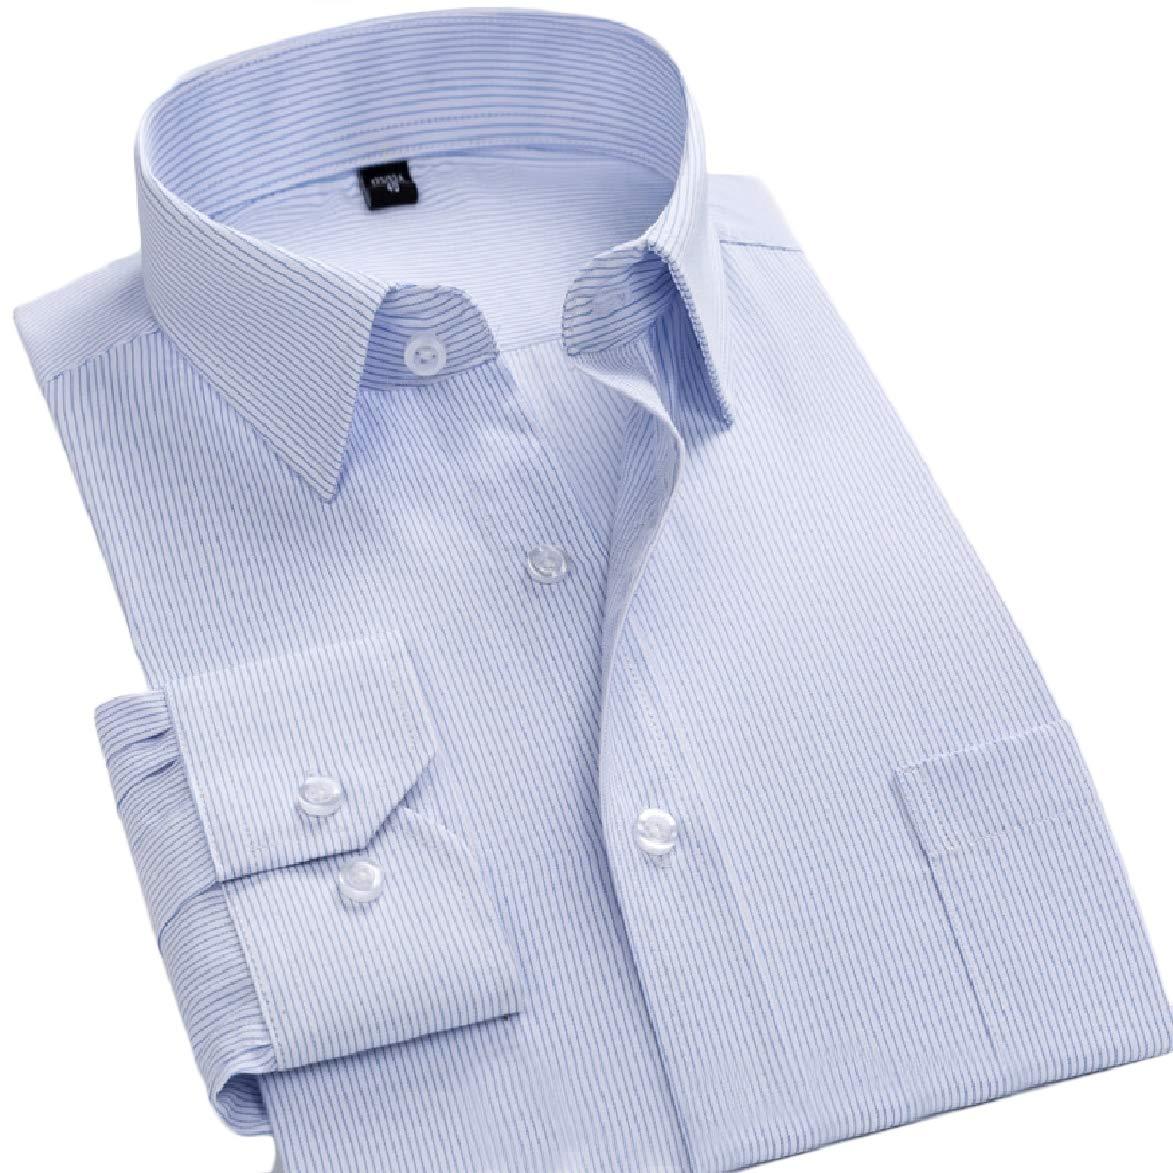 Abetteric Mens Solid Cotton Comfort Business Office Formal Premium Oxford Shirt Pattern13 5XL